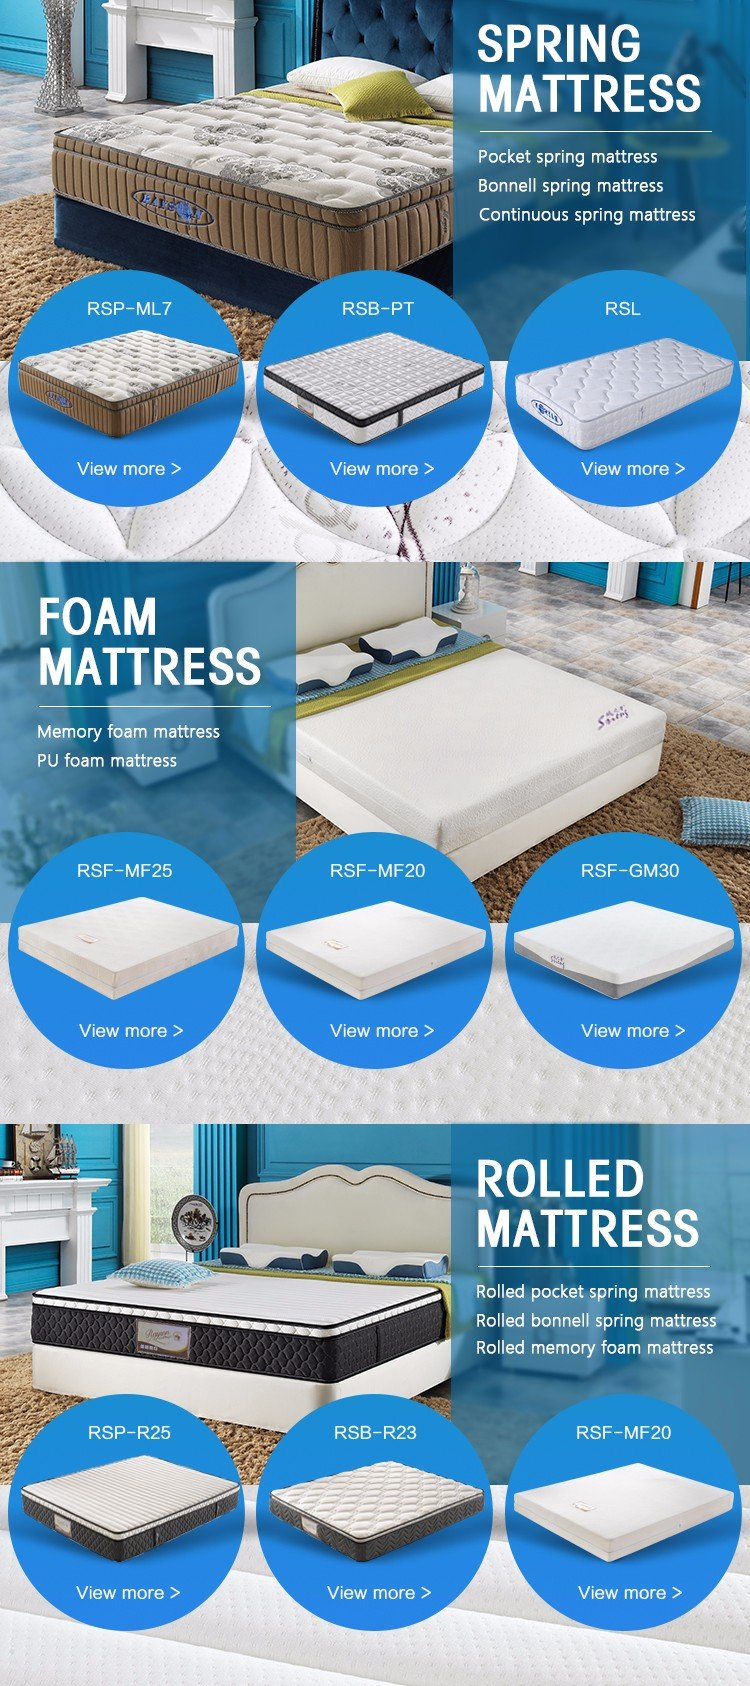 Latest mattress used in hotels mattress Suppliers-10